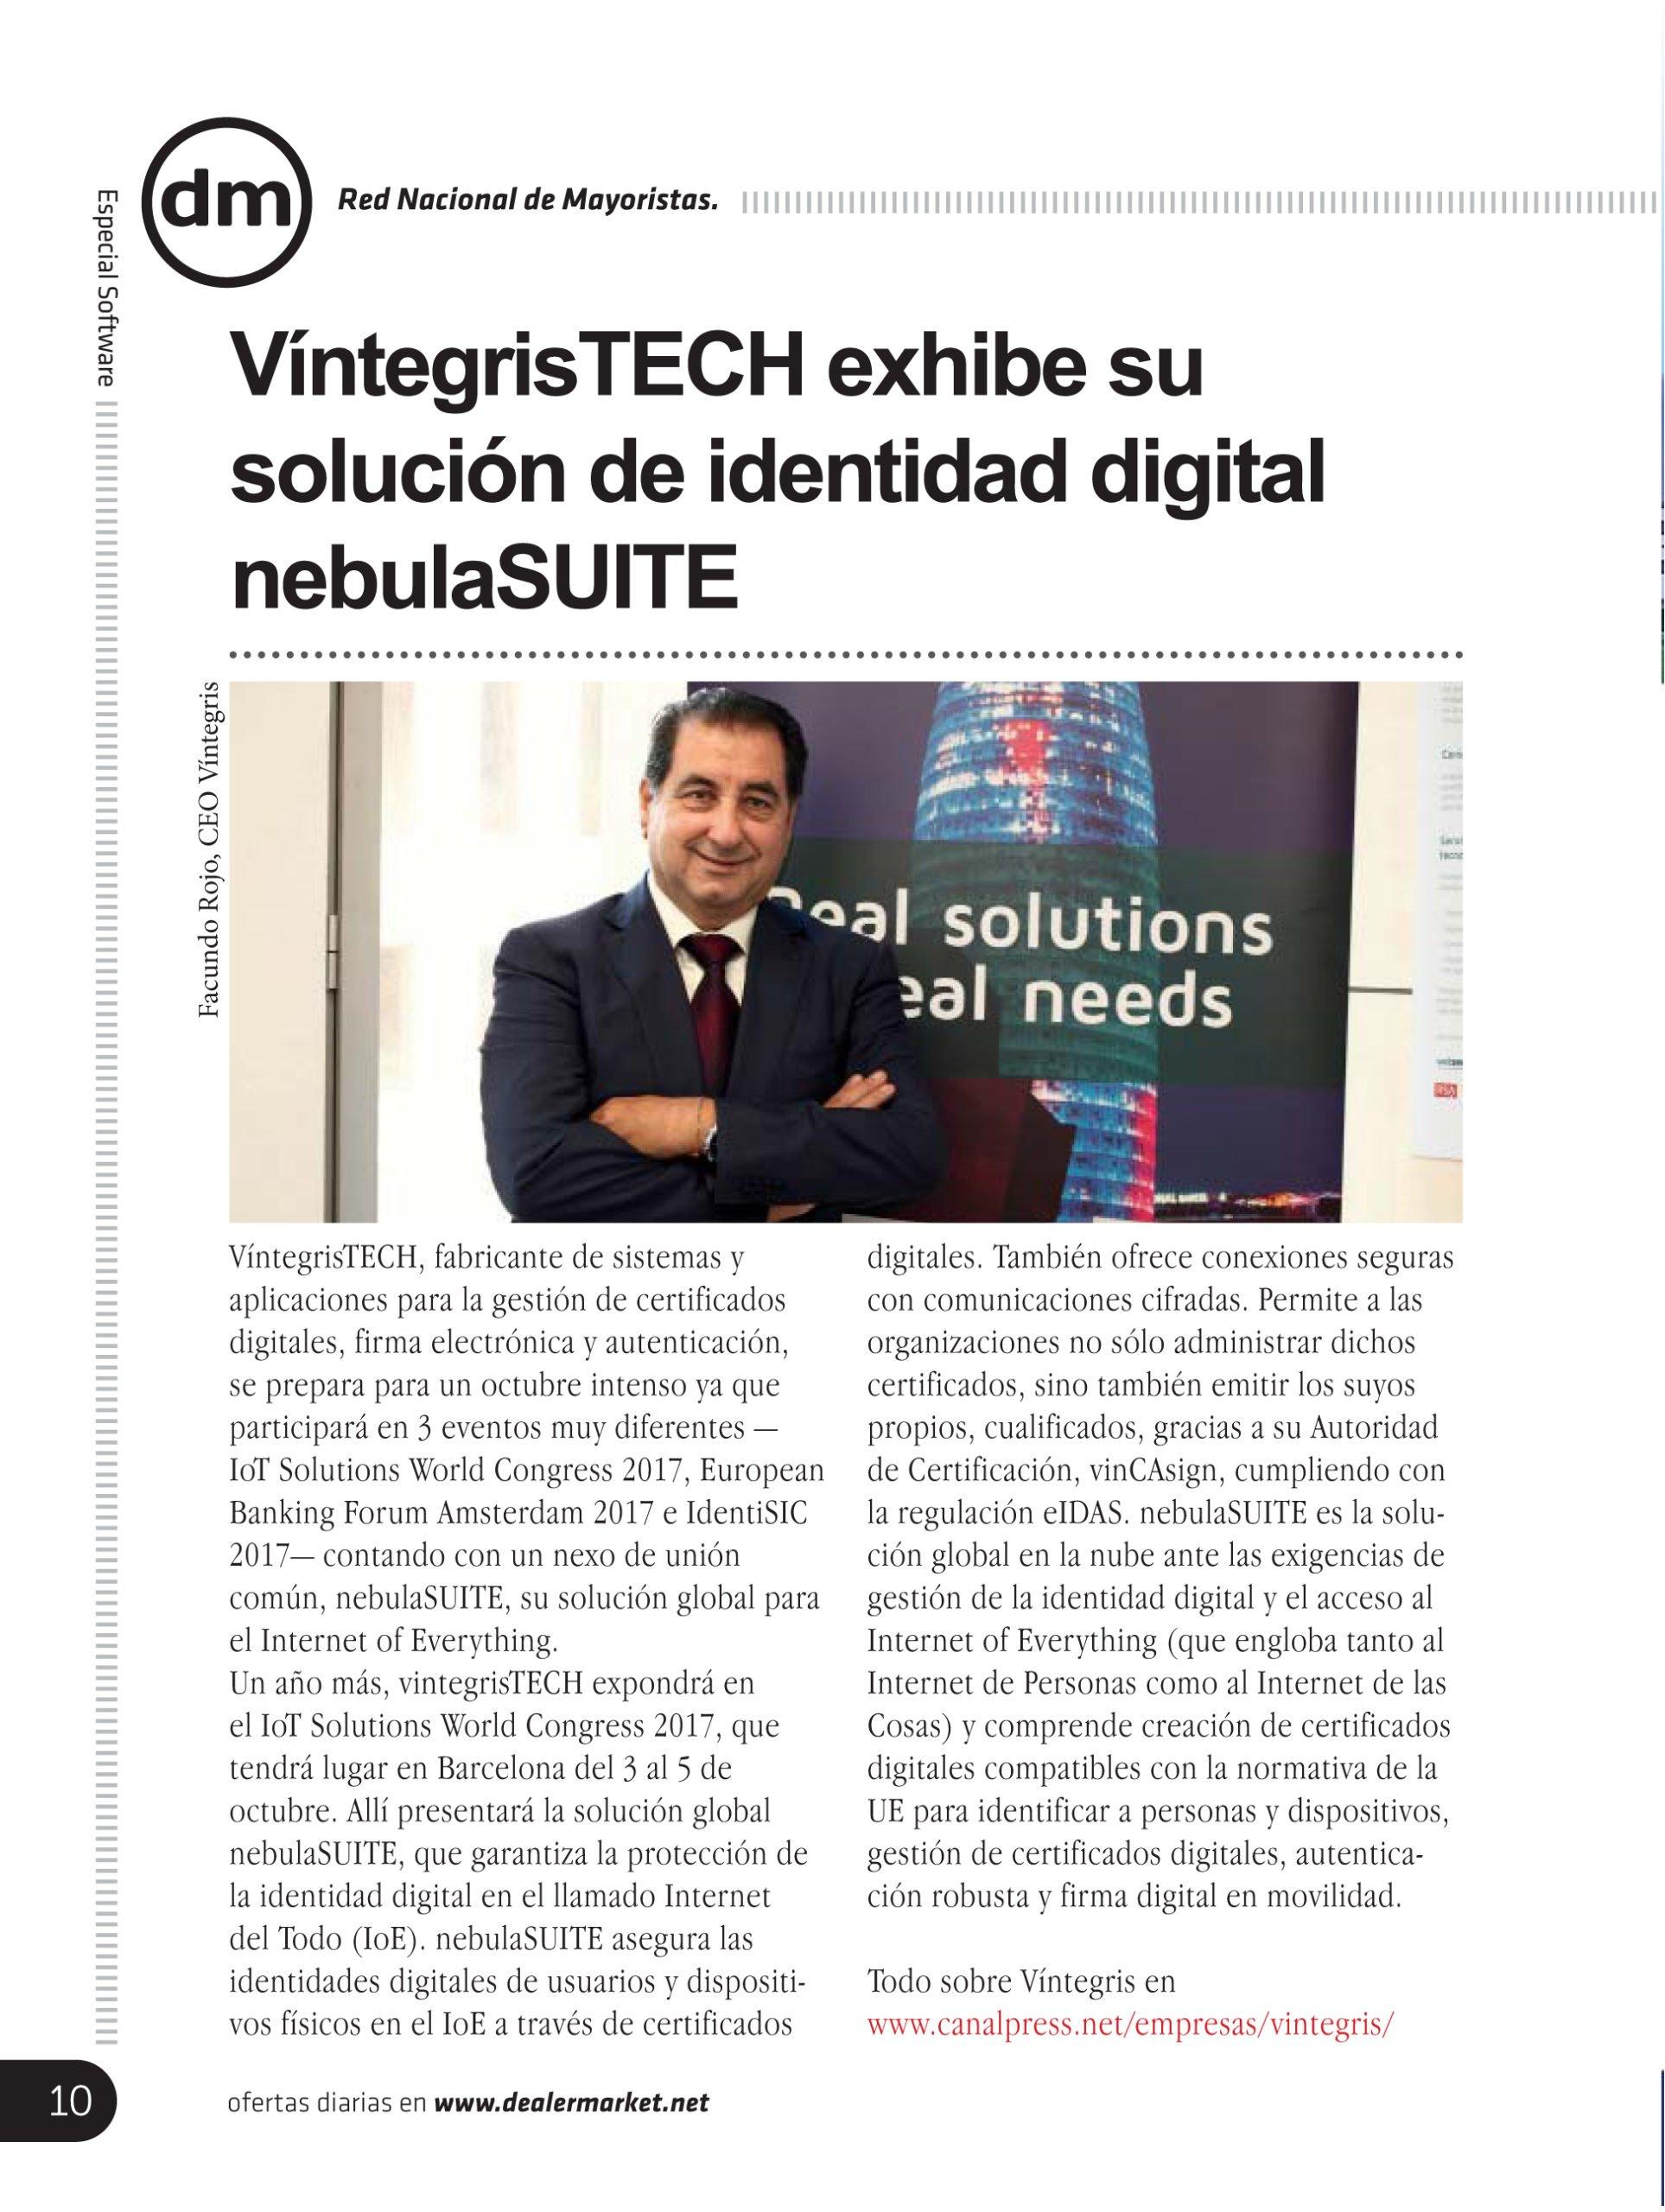 VintegrisTECH displays its nebulaSUITE digital identity solution